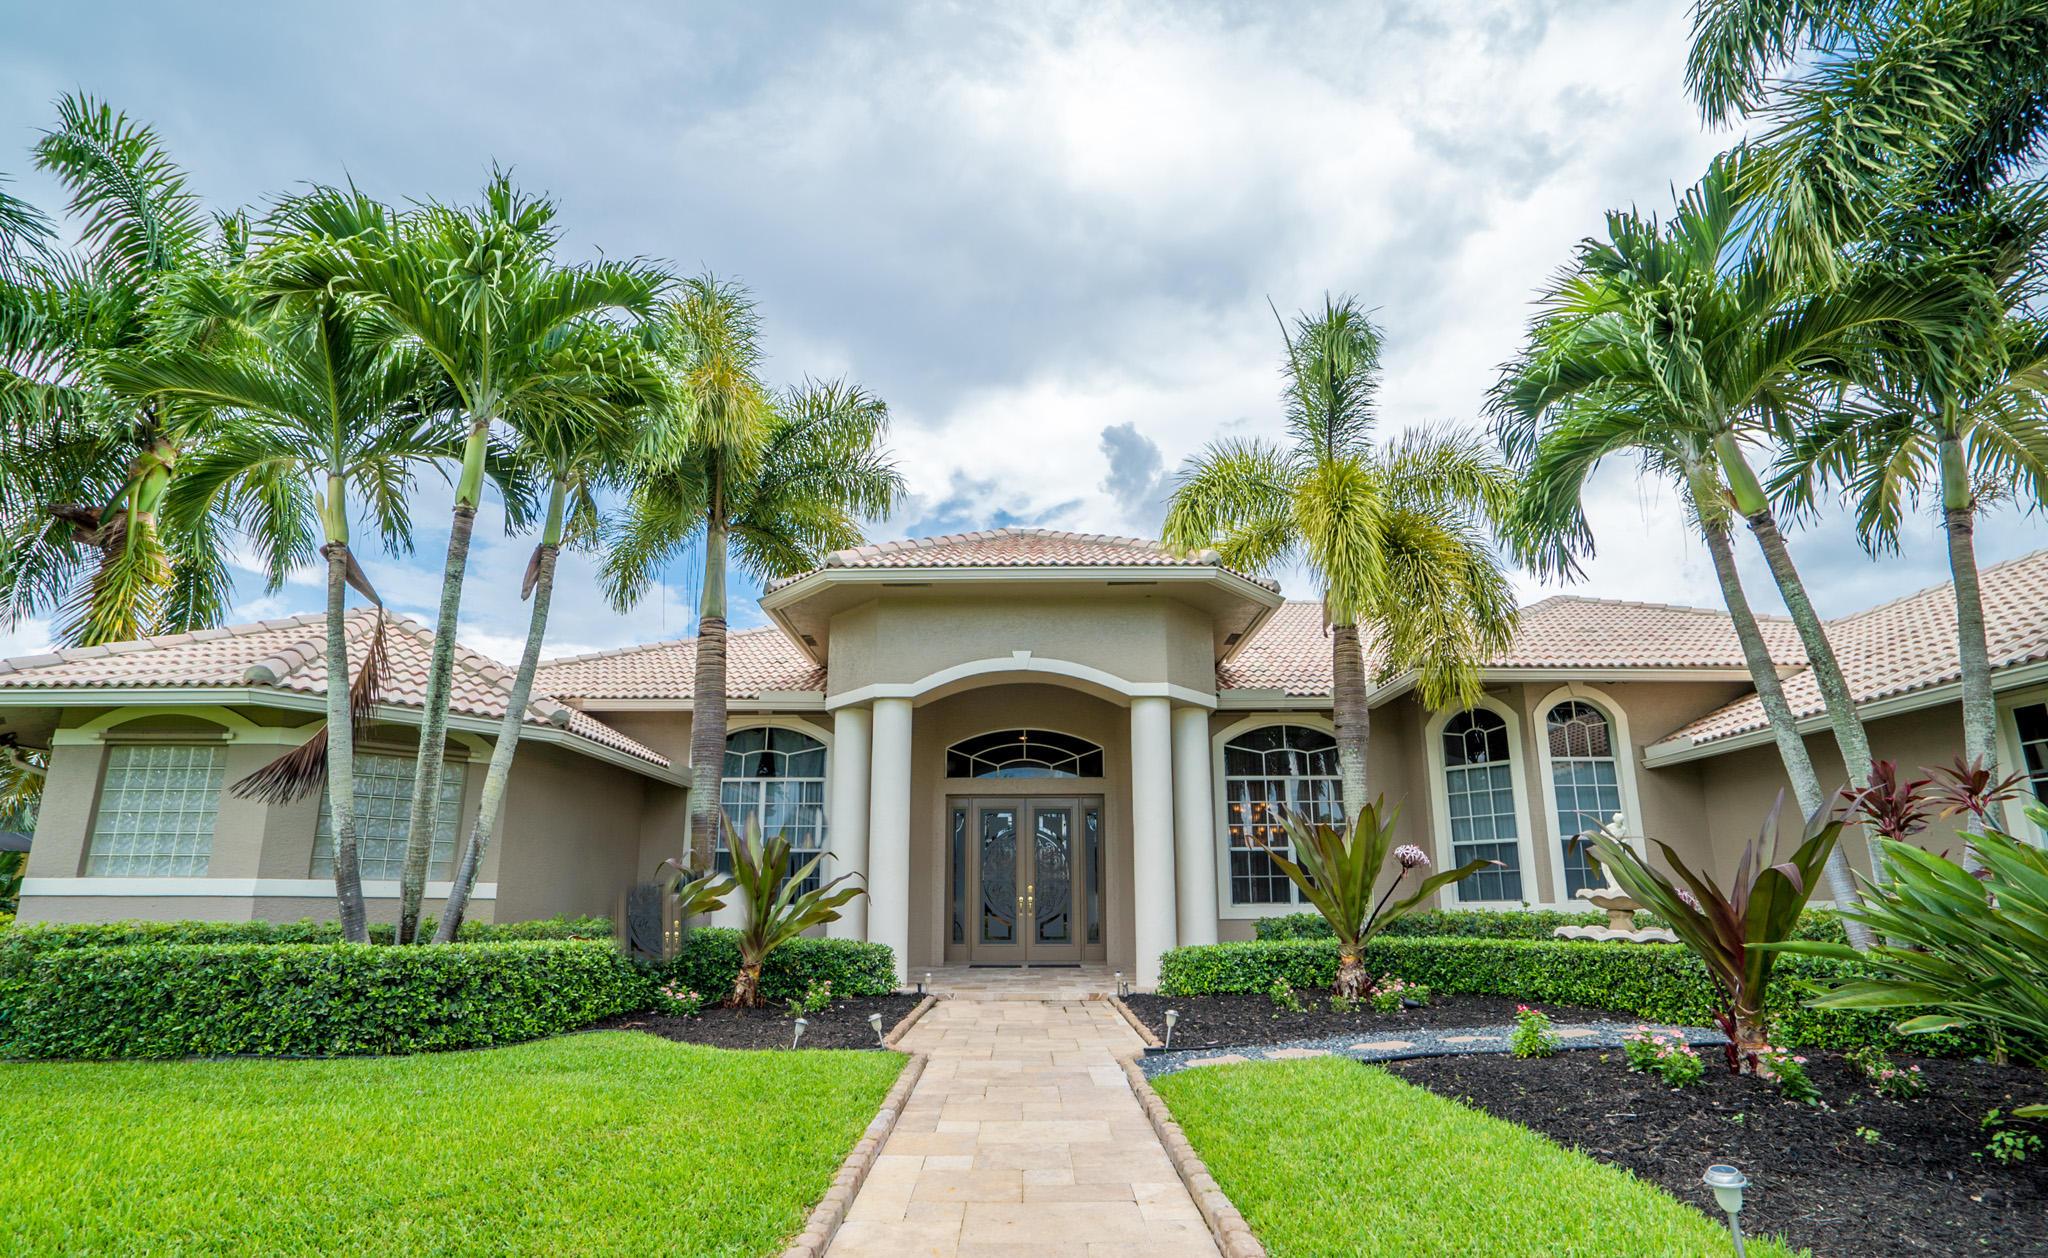 15450 Enstrom Road, Wellington, Florida 33414, 5 Bedrooms Bedrooms, ,4 BathroomsBathrooms,Single Family,For Rent,Enstrom,RX-10470890